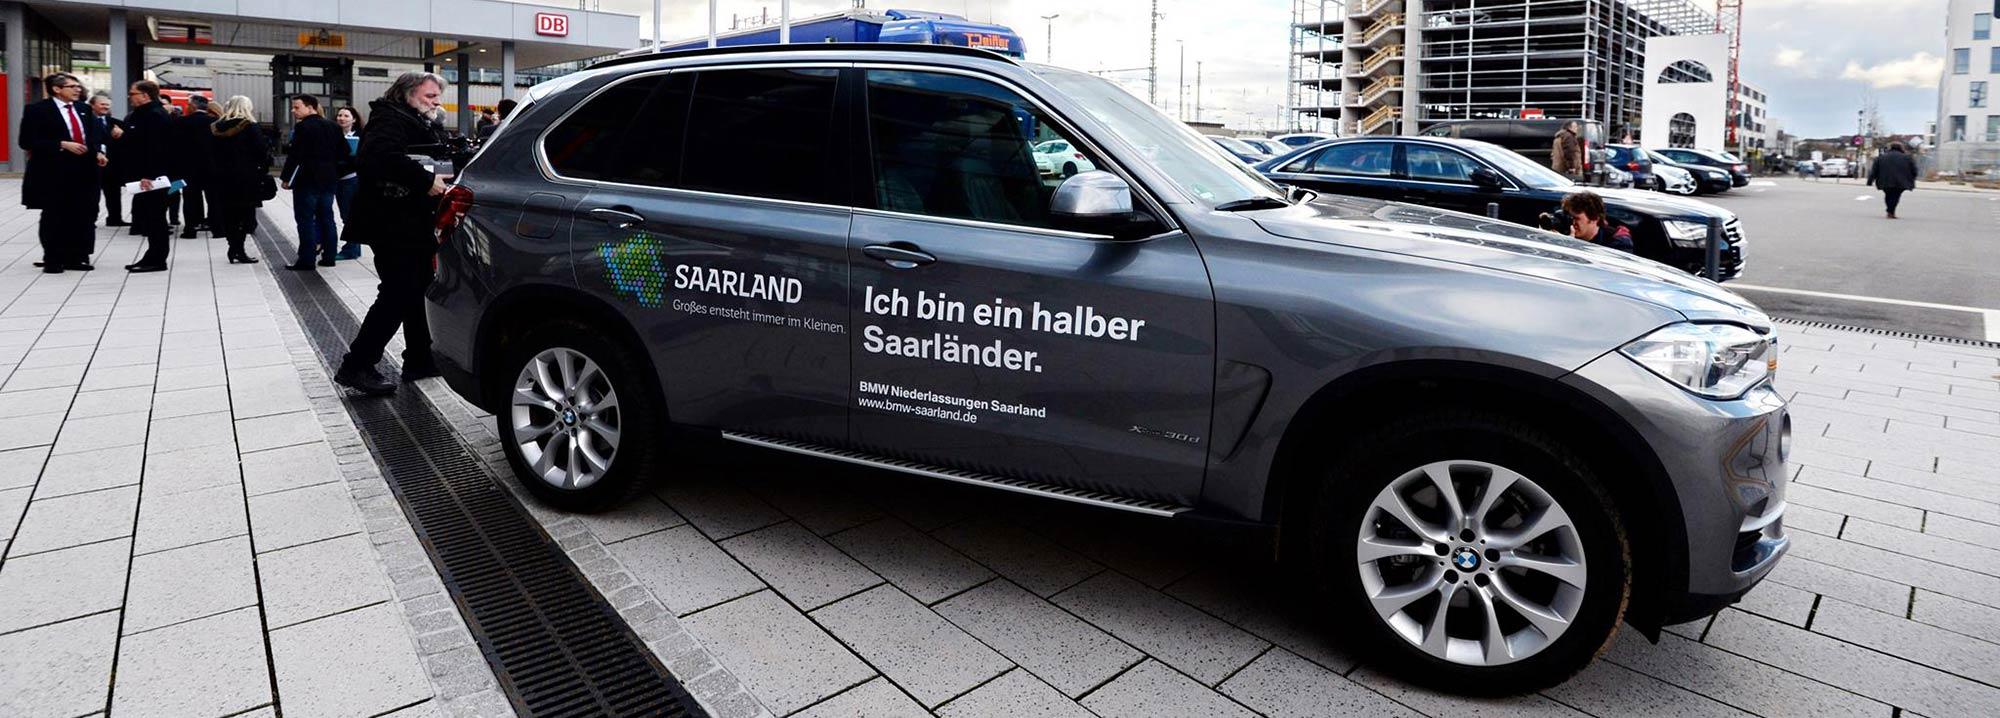 BMW Saarland Marketing